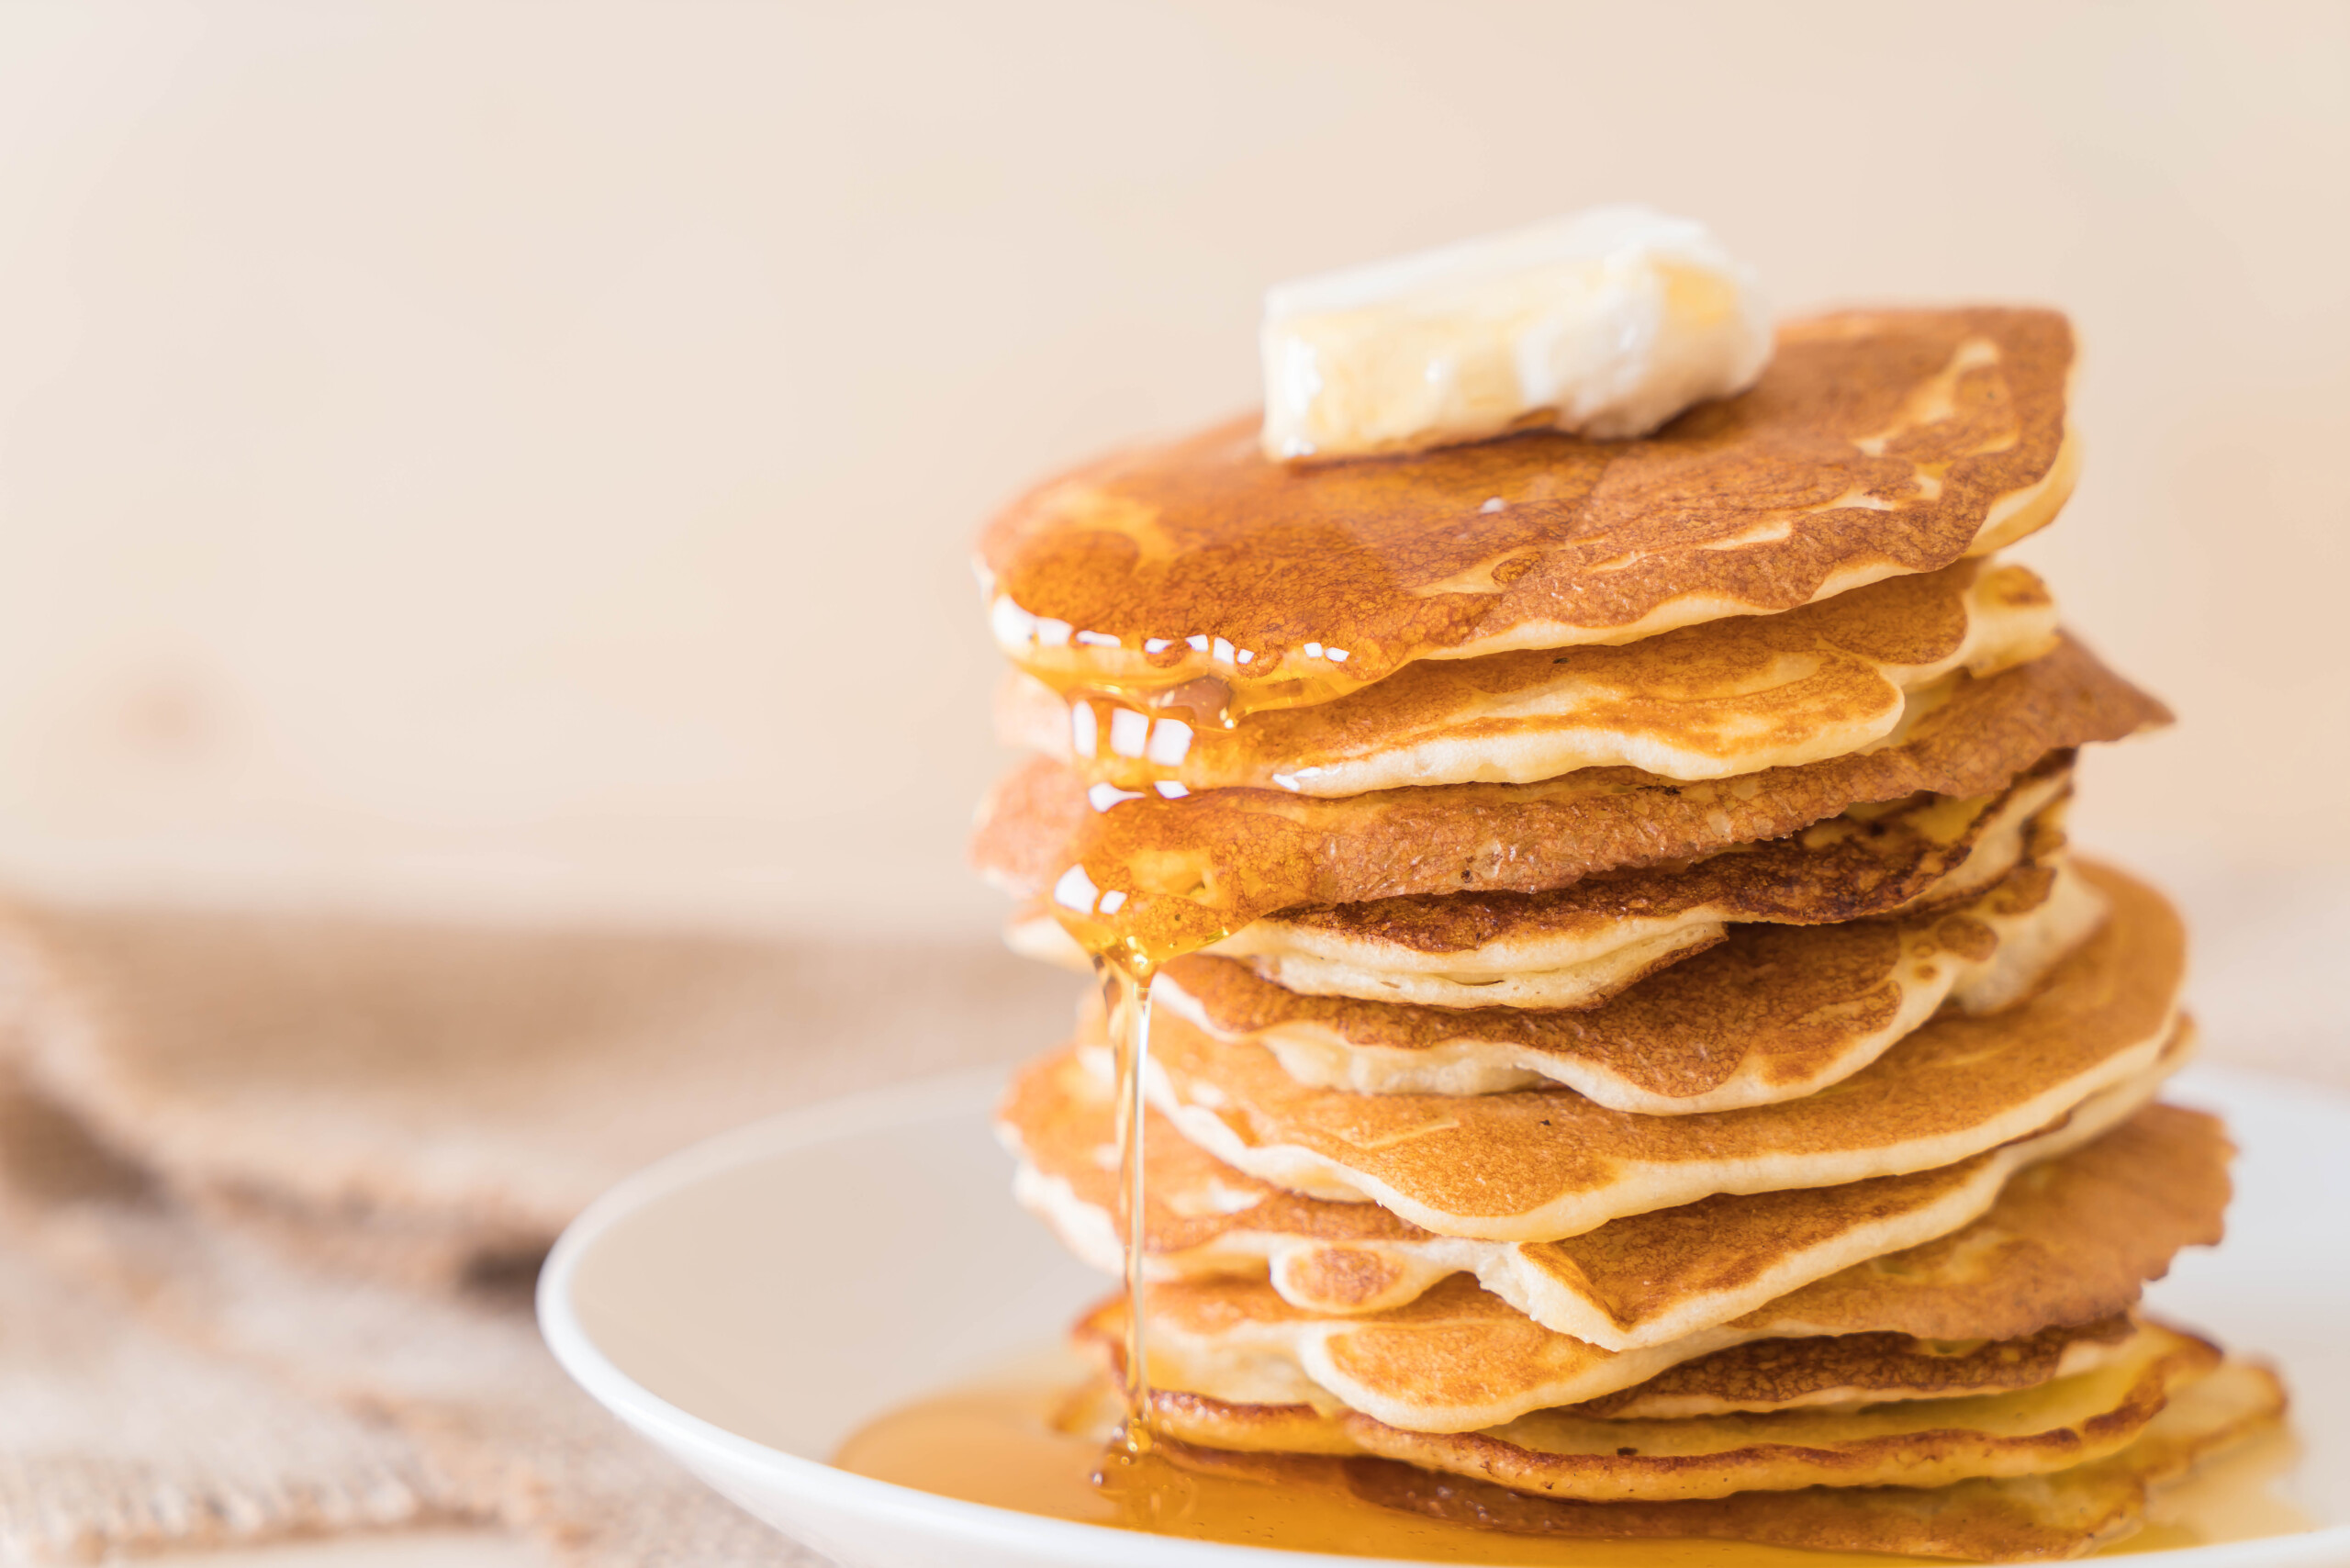 Is a Fast Food Breakfast Healthier than Skipping Breakfast?